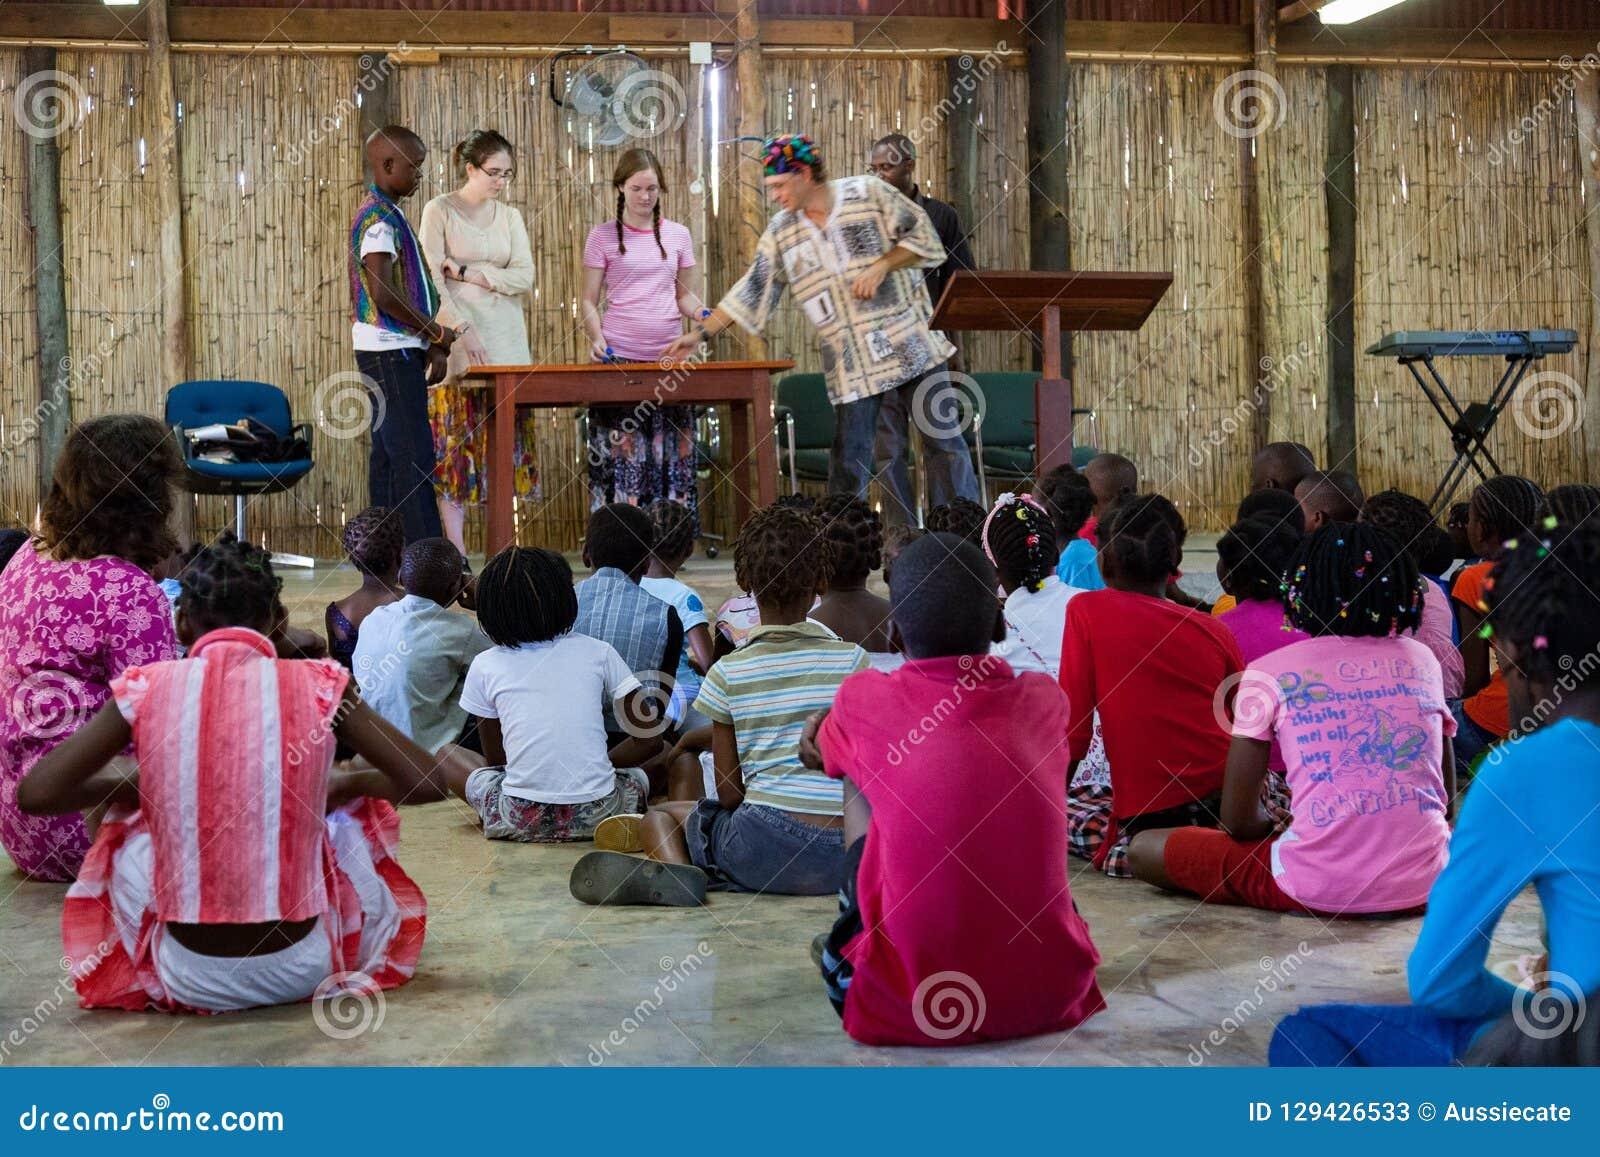 Mozambique Pentacostal Church gathering scenes in Xai Xai